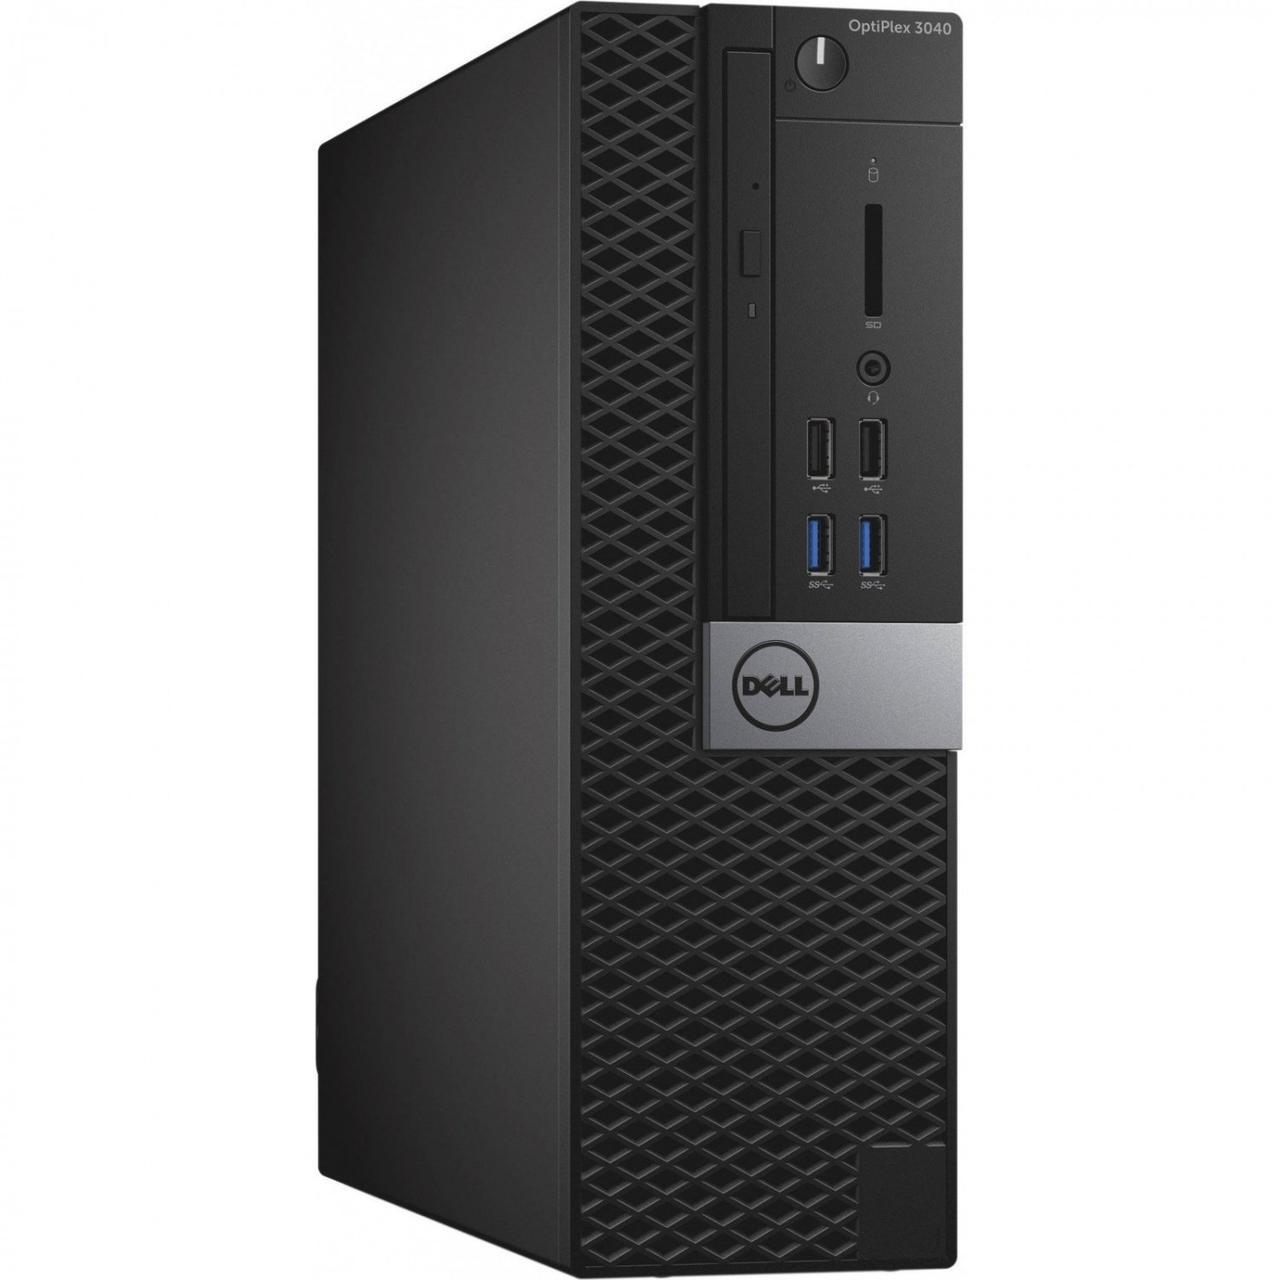 Системный блок Dell Optiplex 5050 SFF-Intel Core-i3-7100-3.9GHz-4Gb-DDR4-HDD-500Gb- Б/У